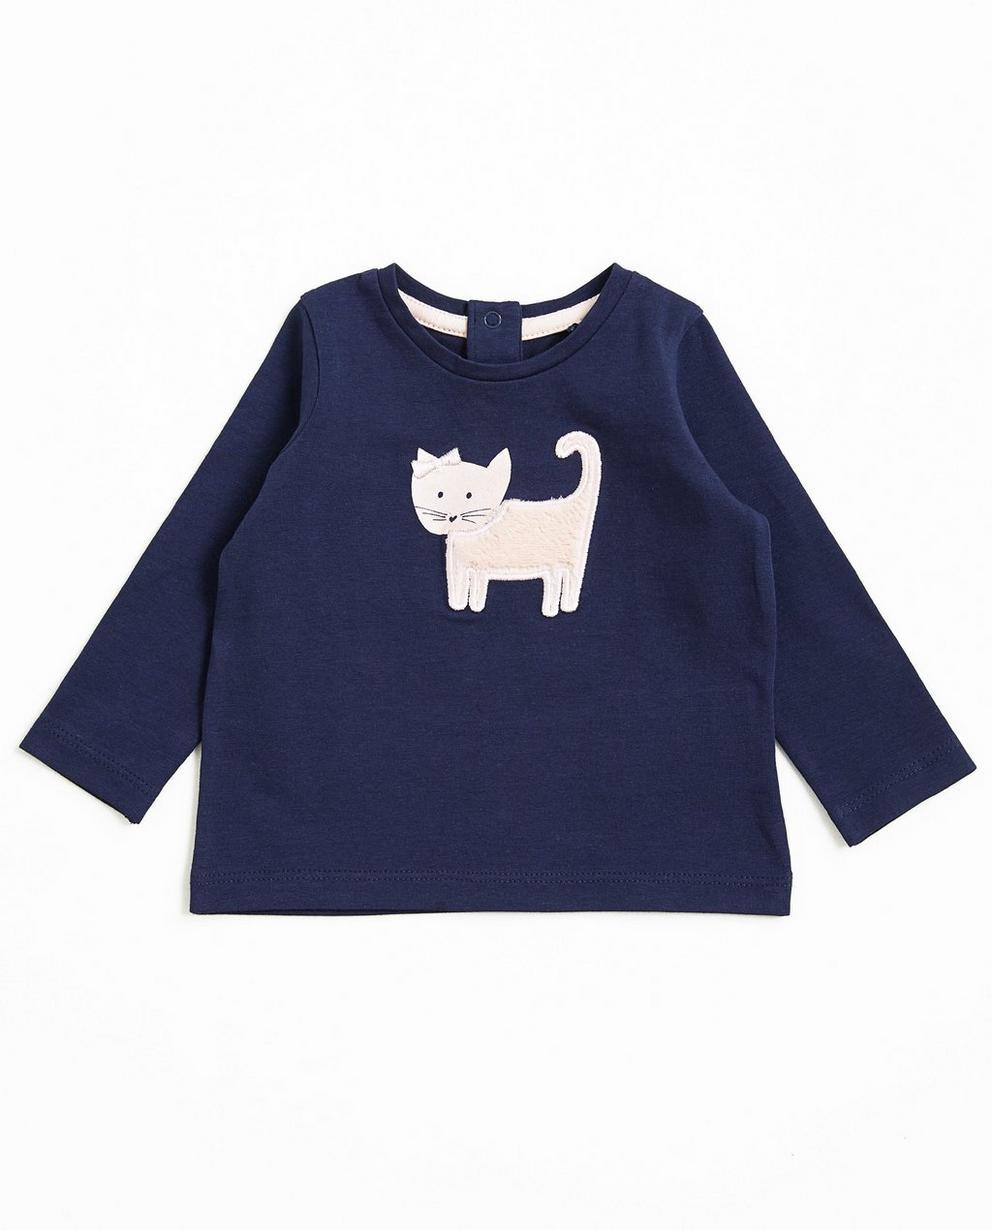 T-shirt à manches longues - petit chat, bleu marine - Newborn